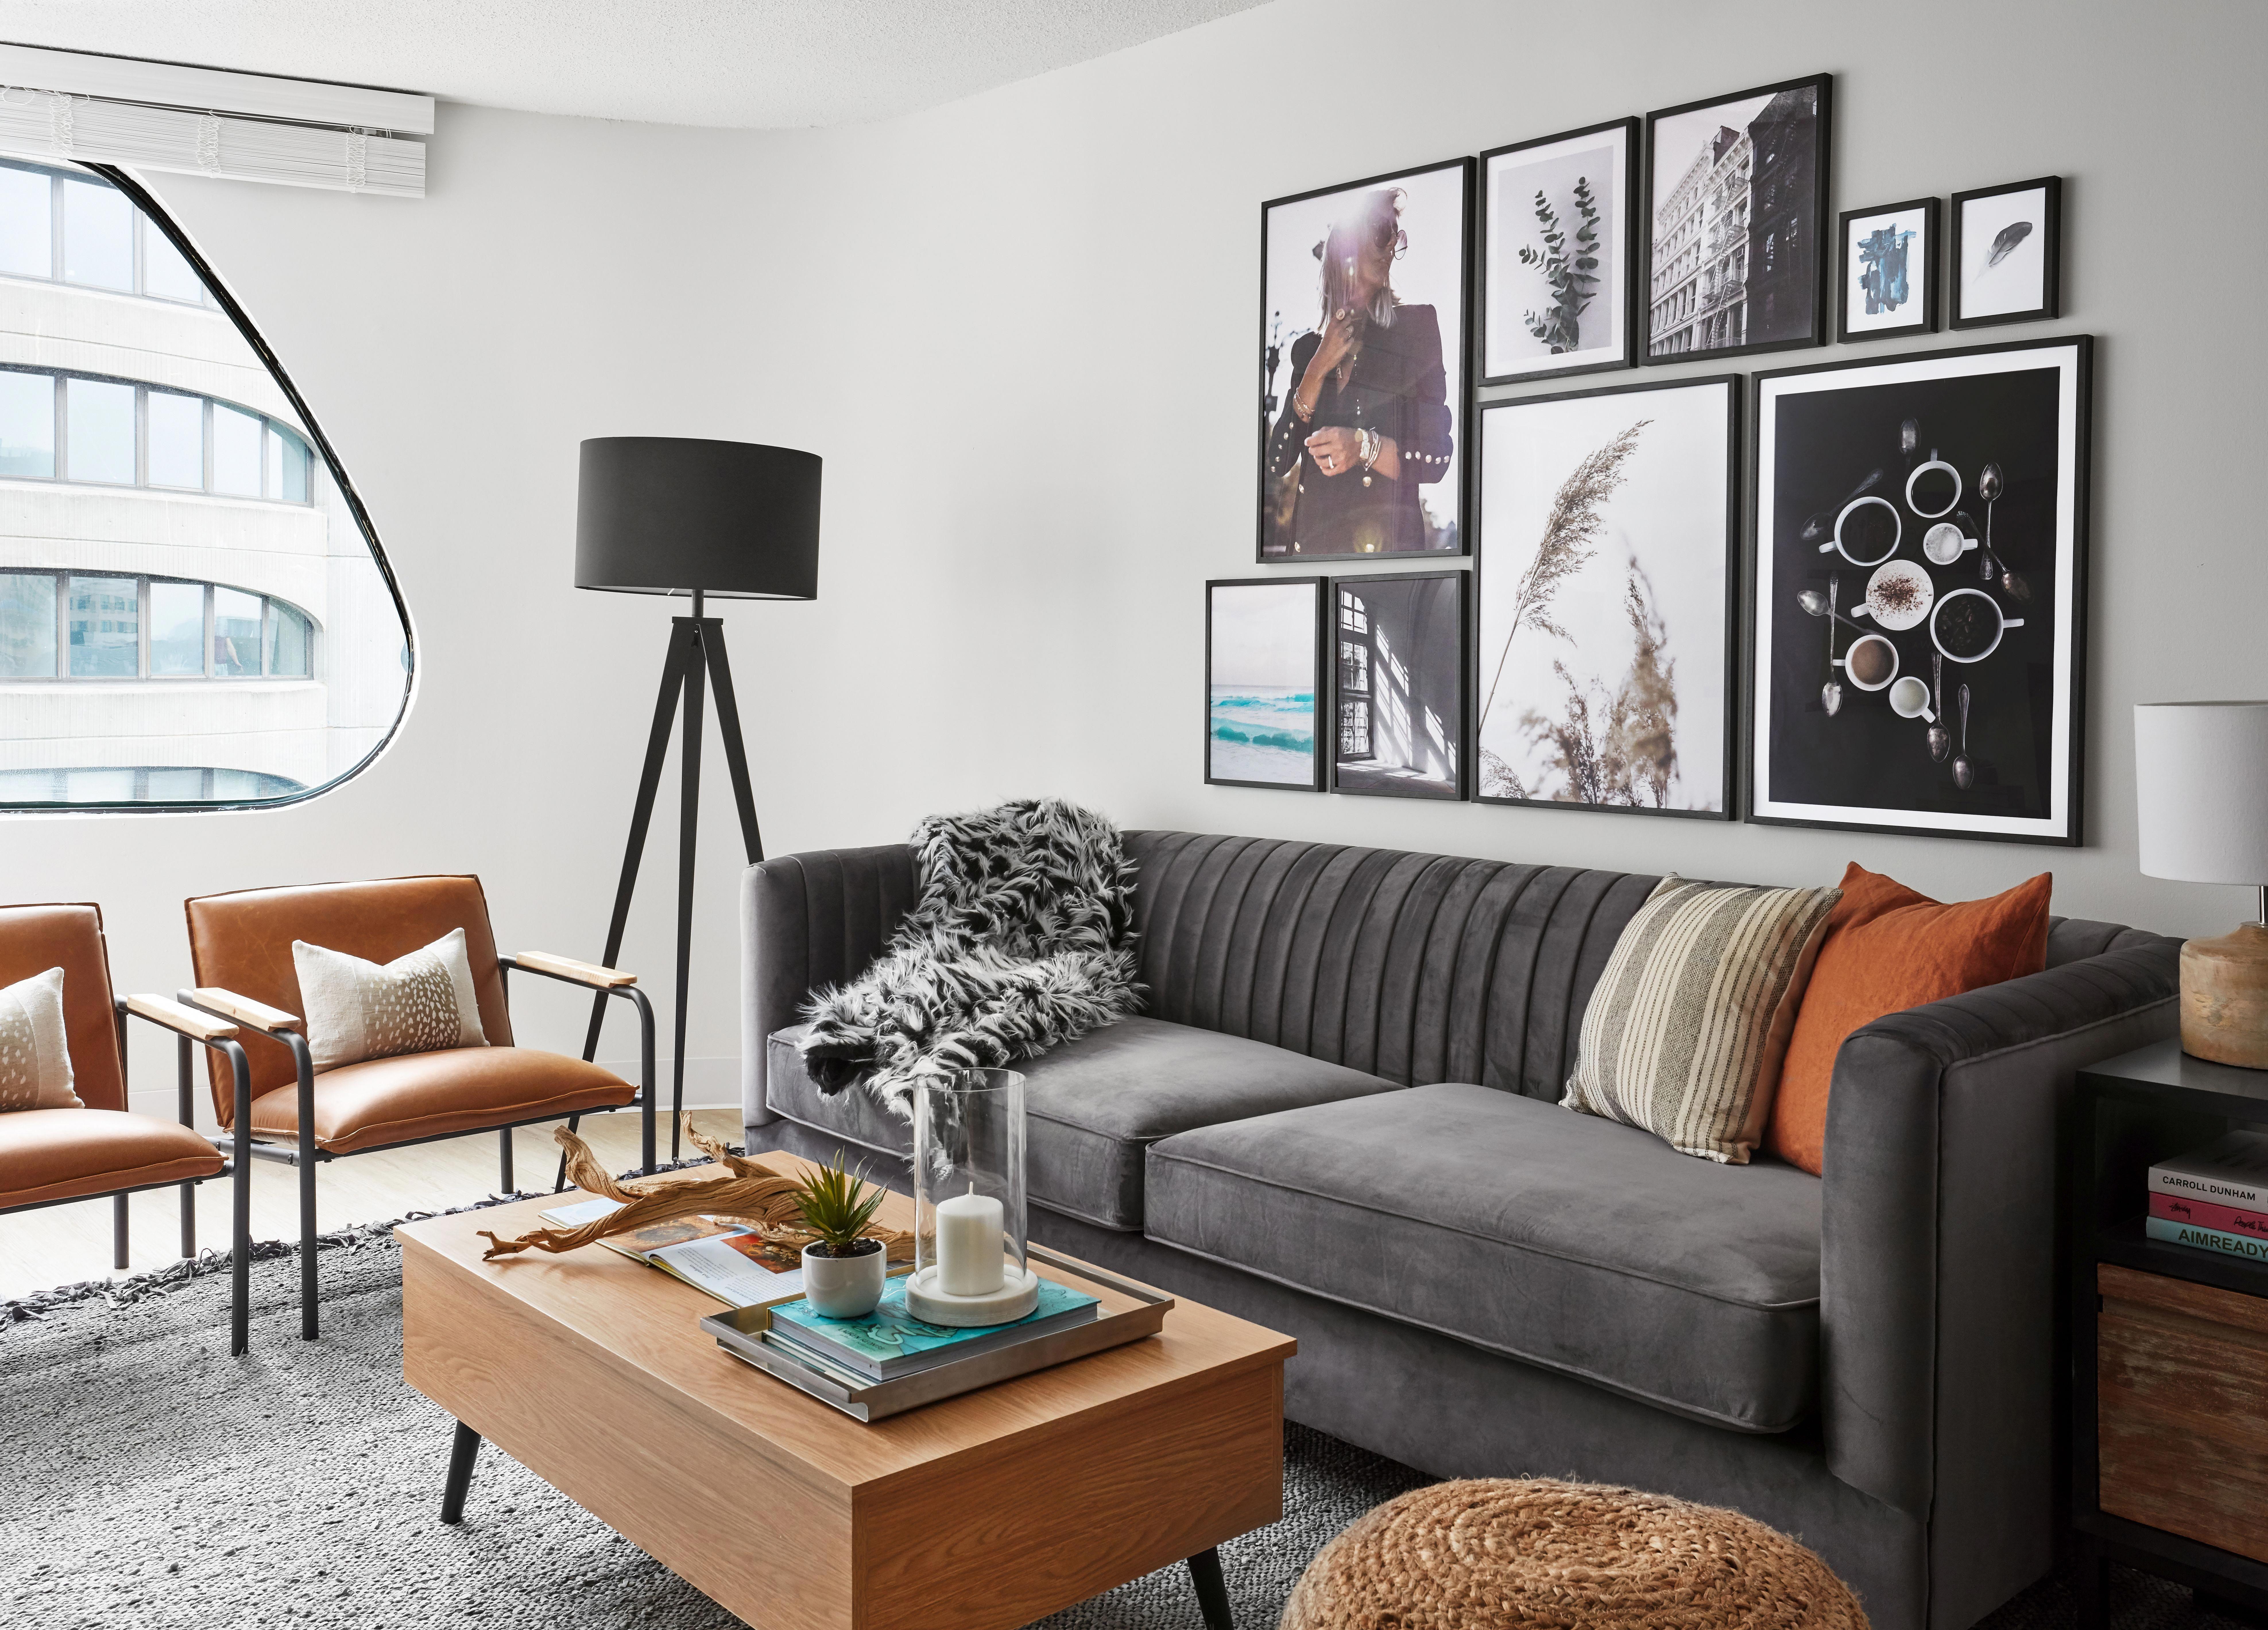 Modern Living Room With Hardwood Floors Grey Suede Couch Orange